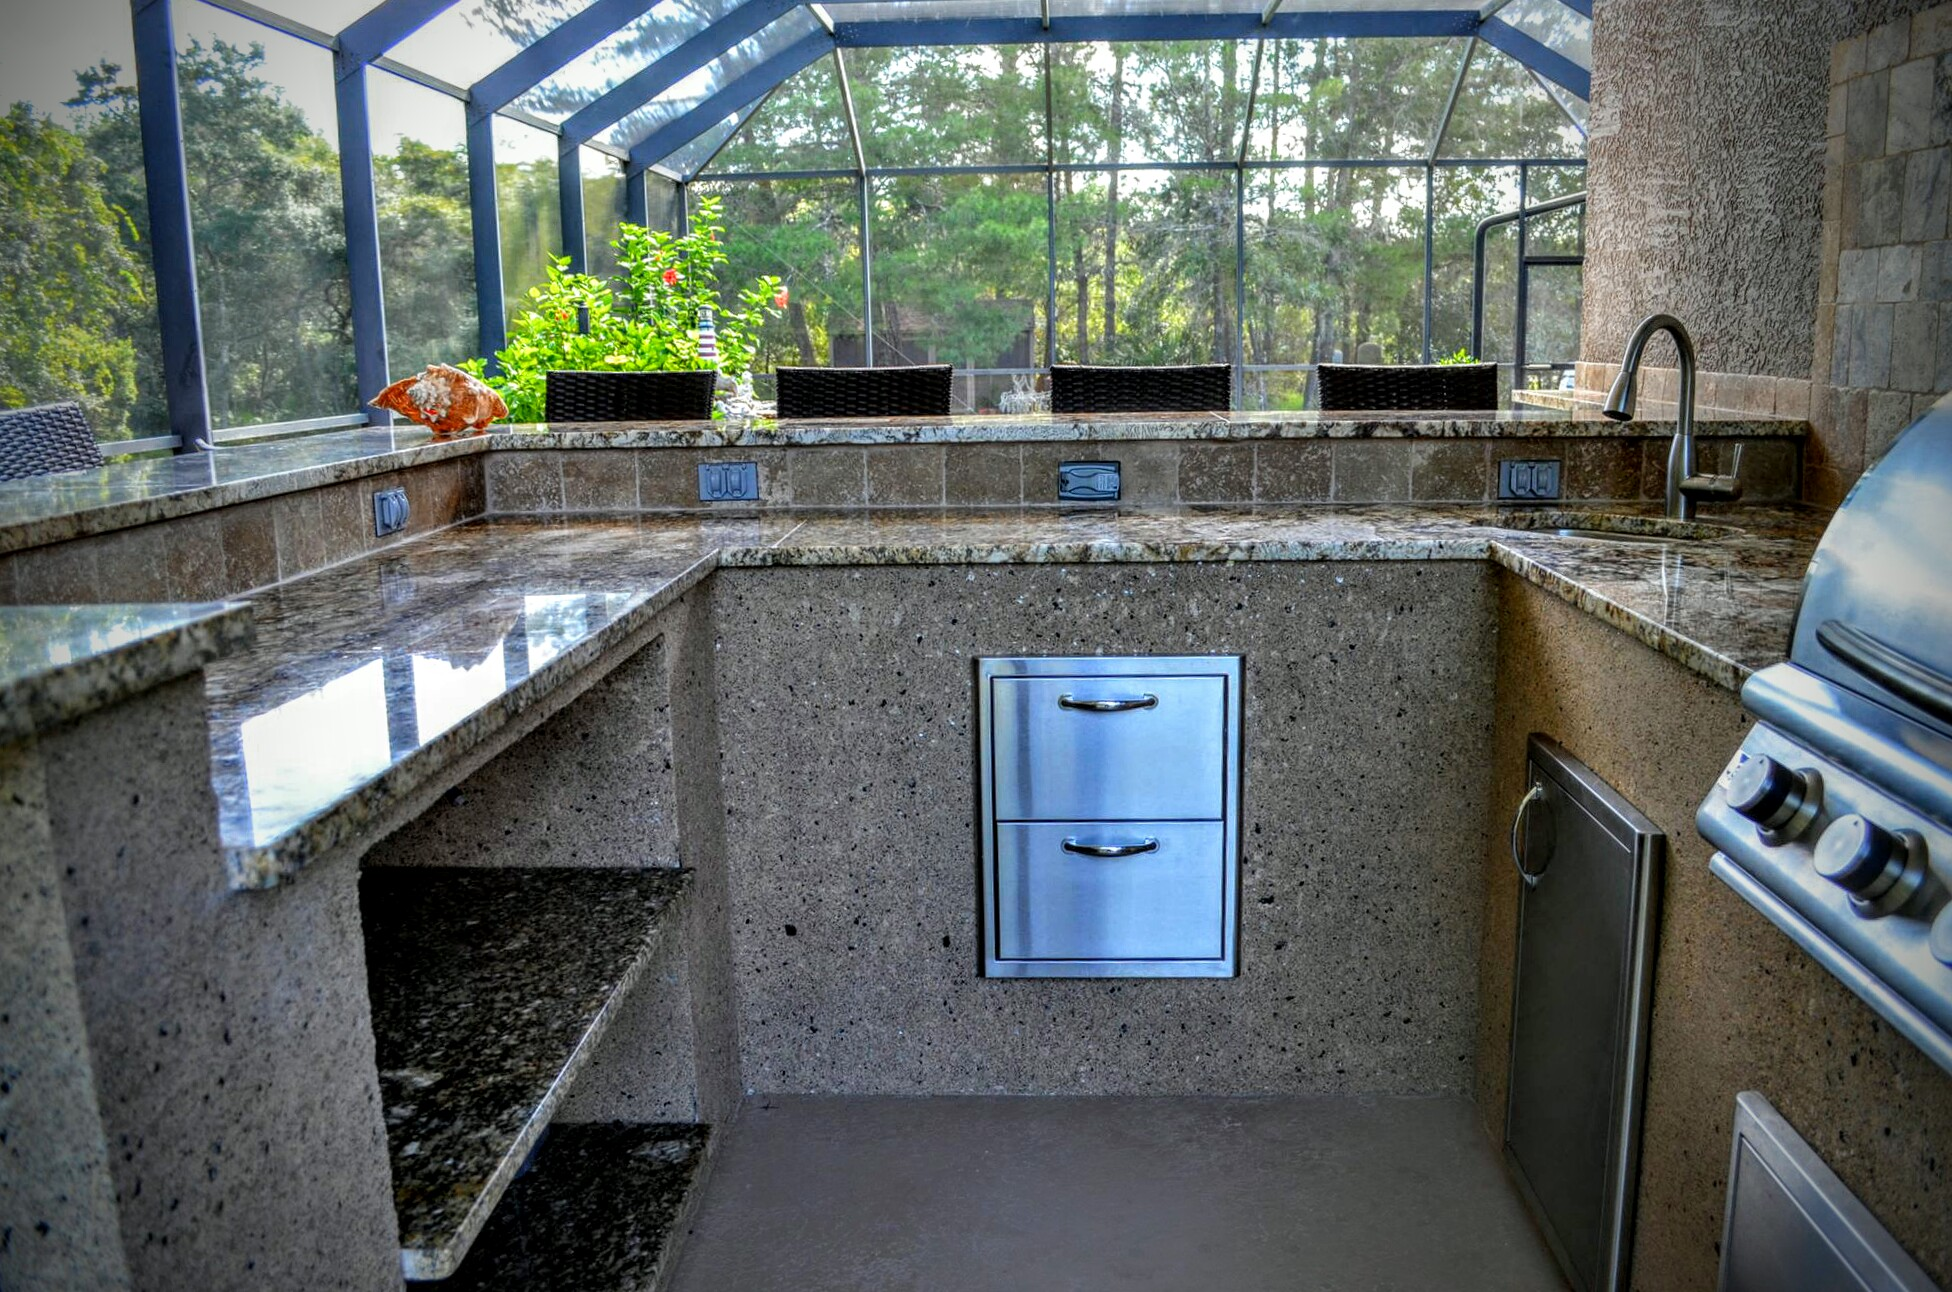 New Outdoor Kitchen Setup To Entertain Creative Outdoor